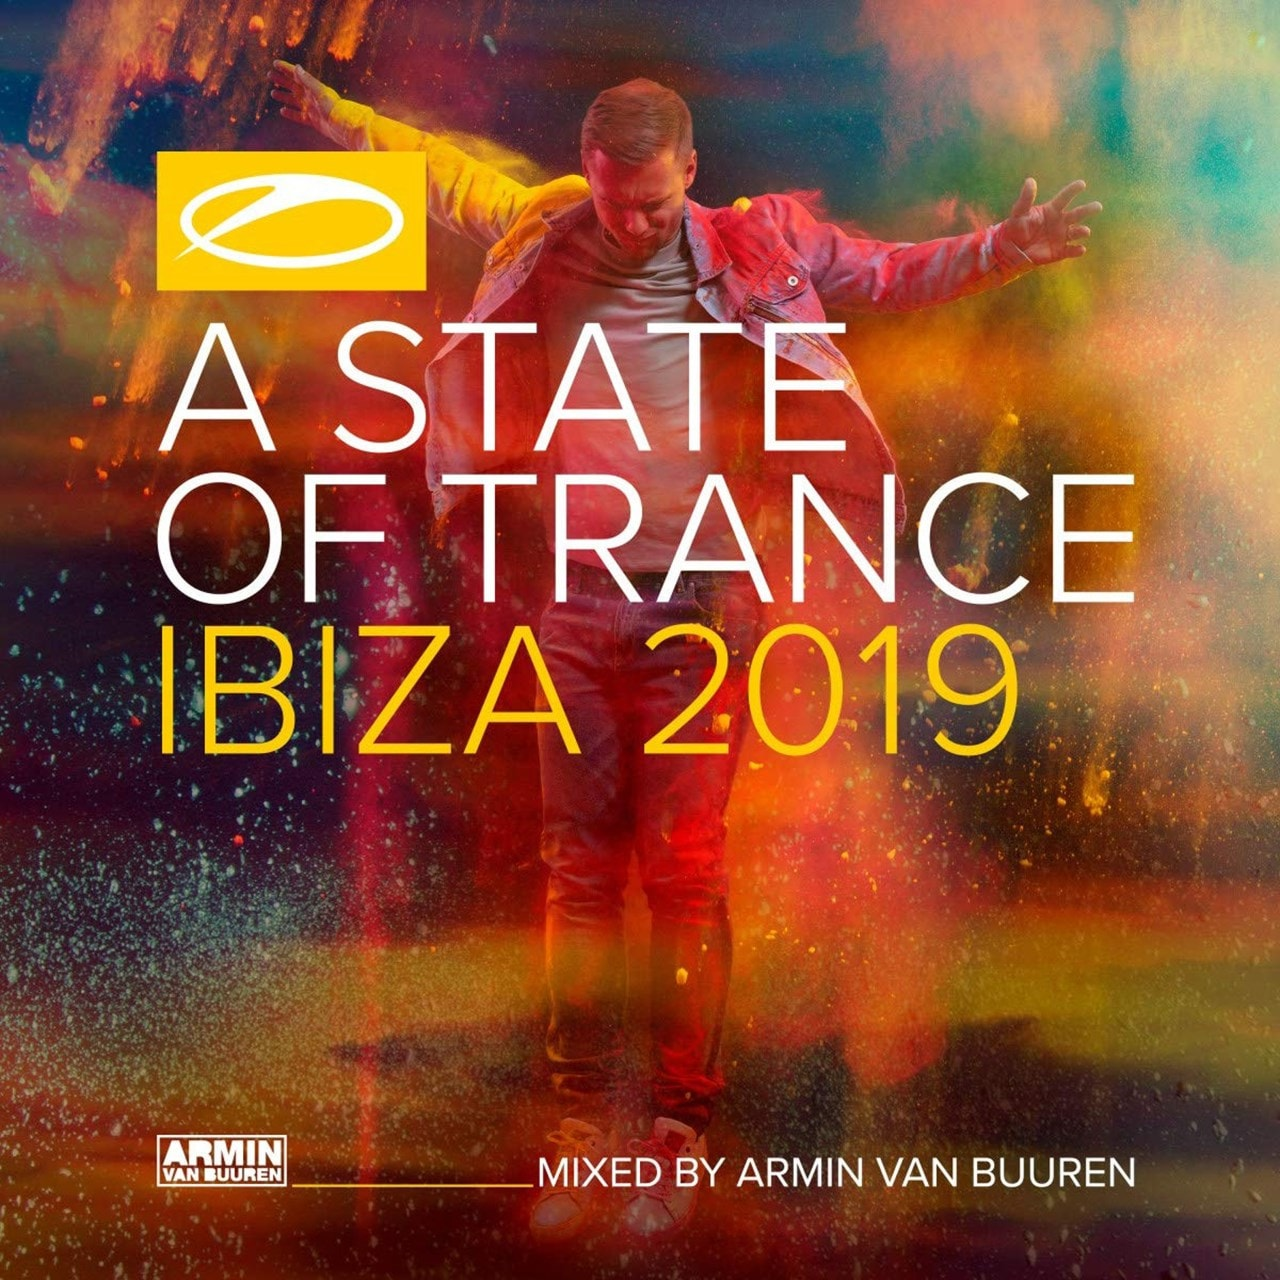 A State of Trance: Ibiza 2019 - 1